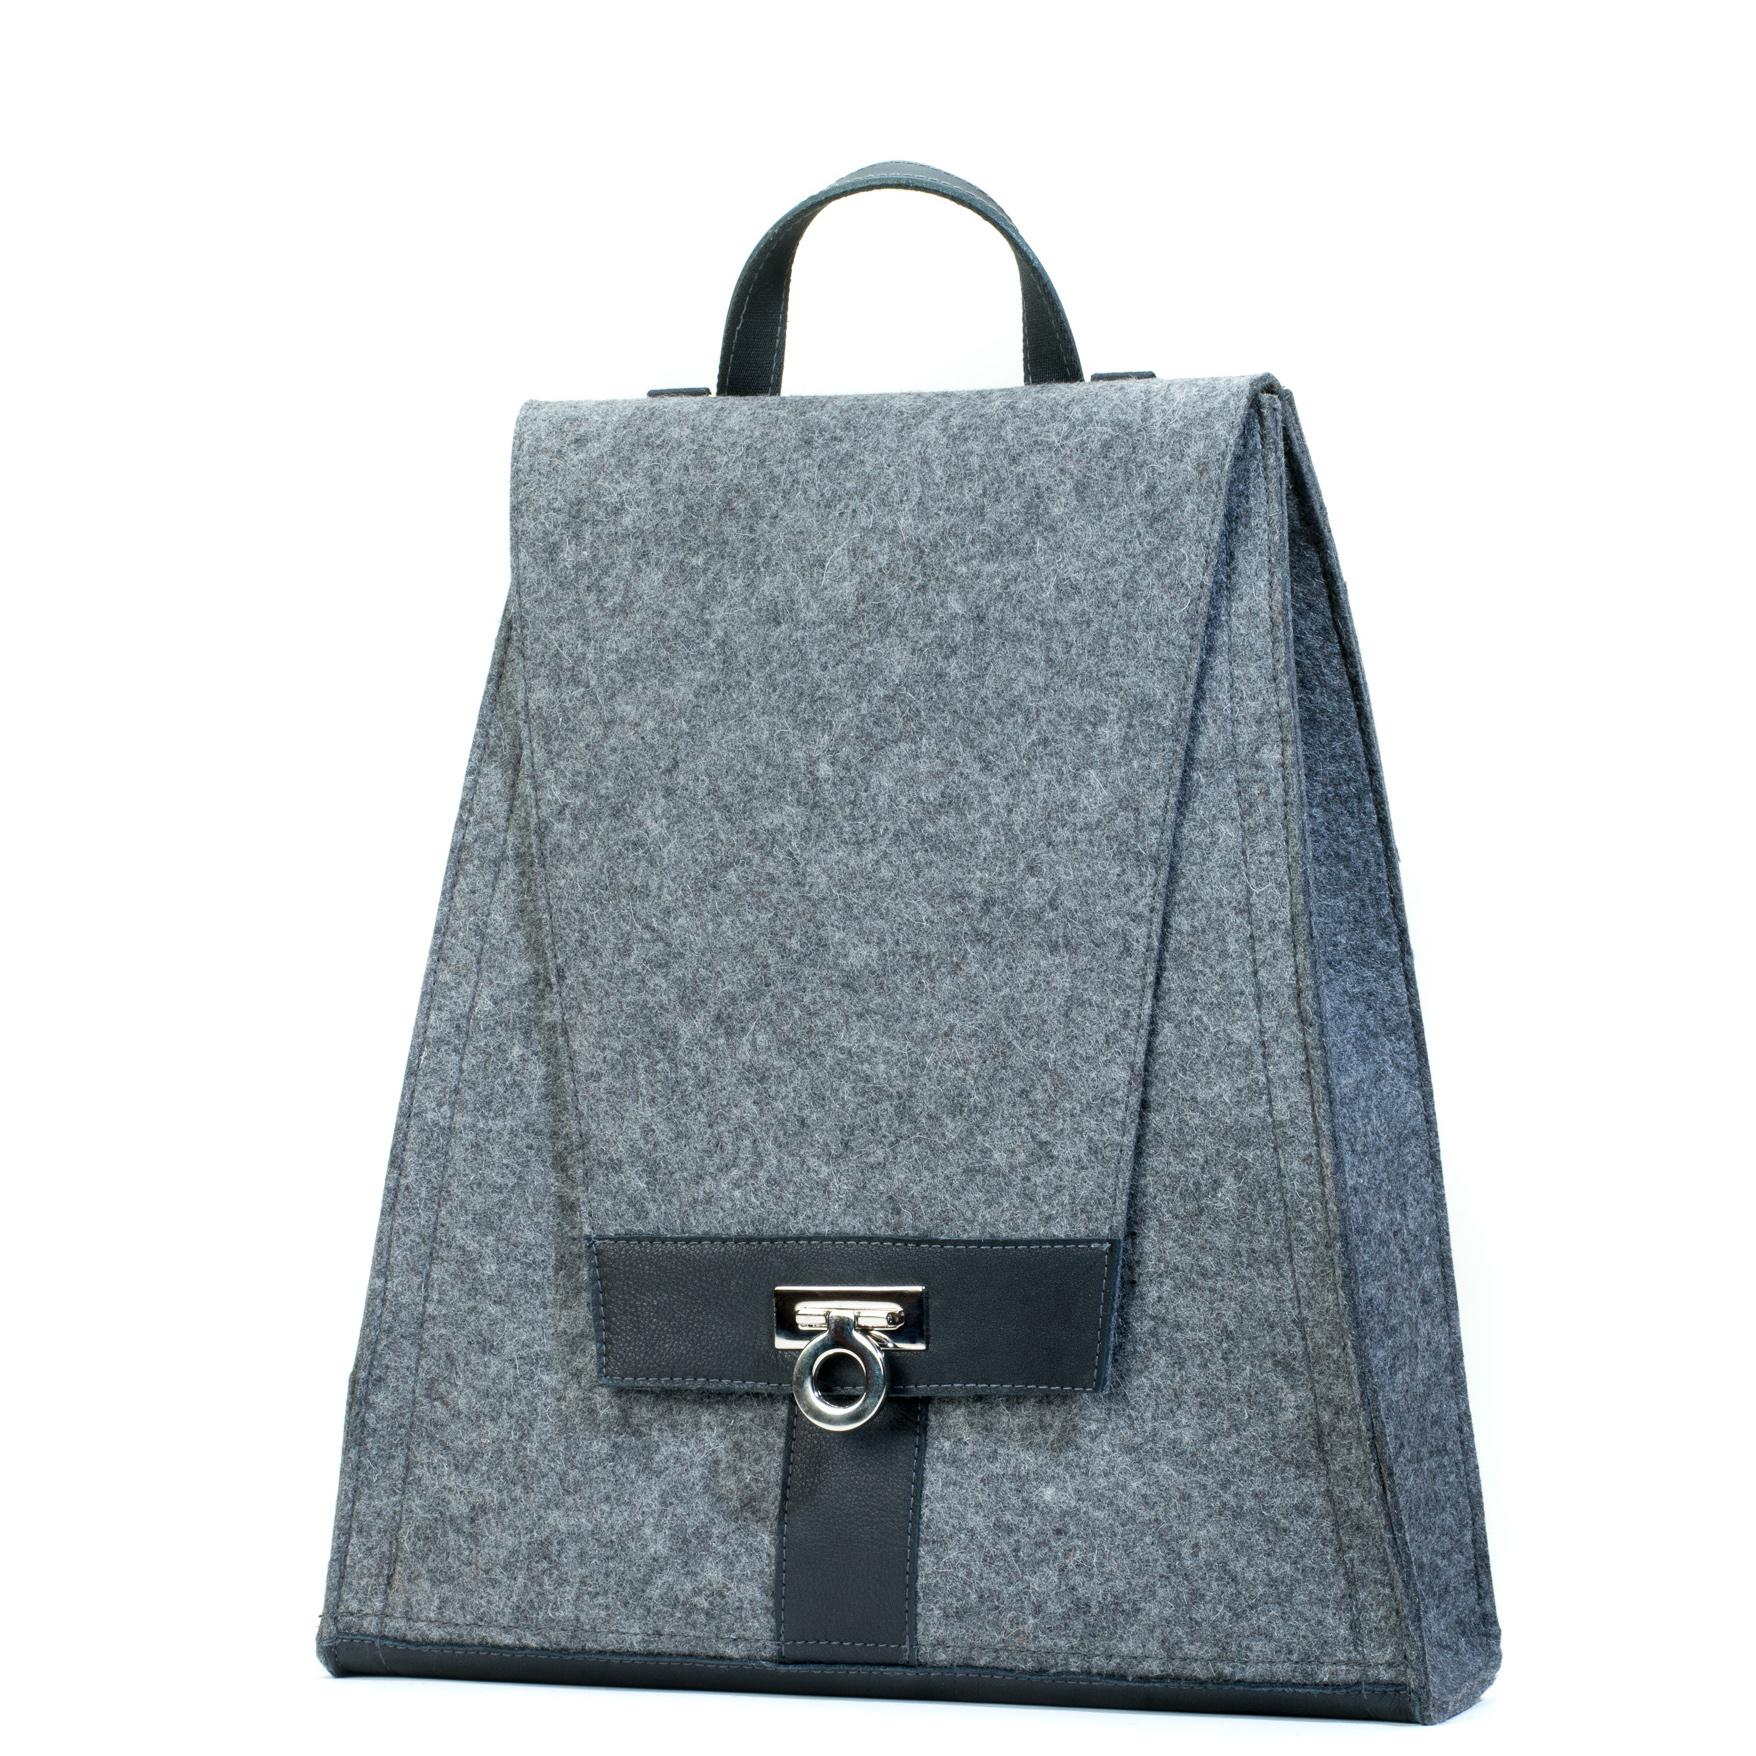 damen-handtasche-filz-grau-leder-rucksack-designer-shop